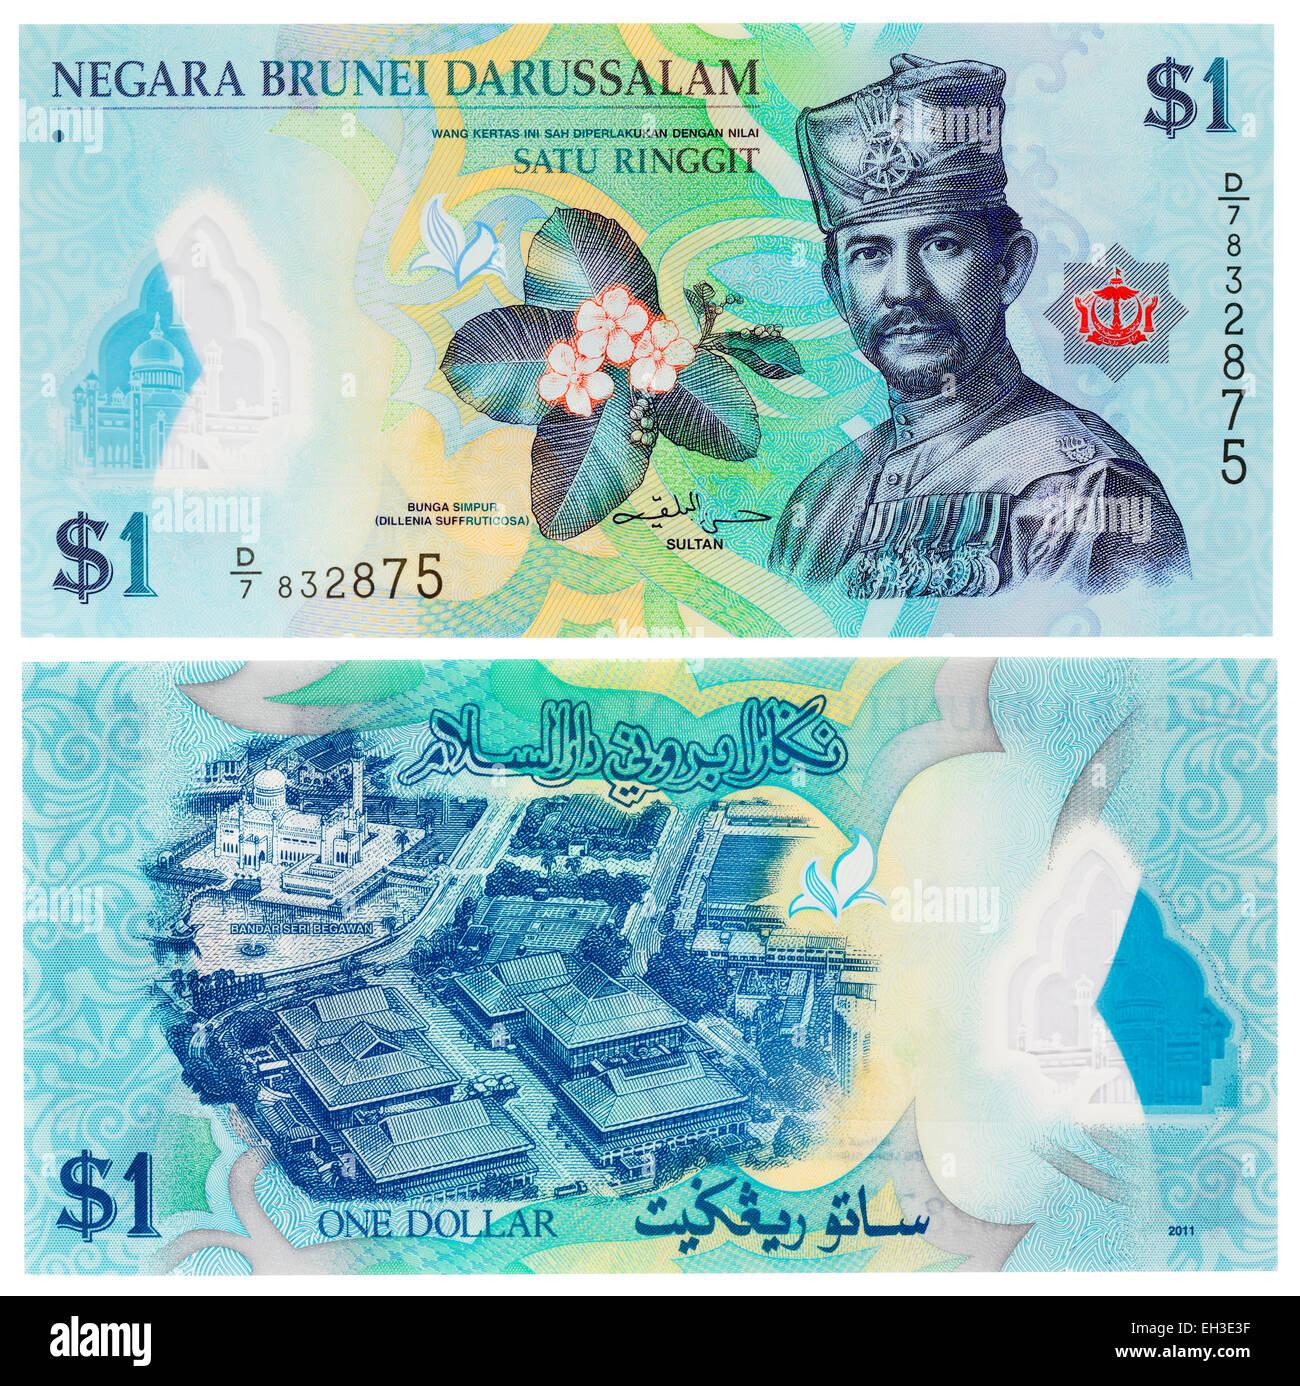 1 ringgit banknote, Sultan Hassanal Bolkiah, Brunei, 2011 - Stock Image